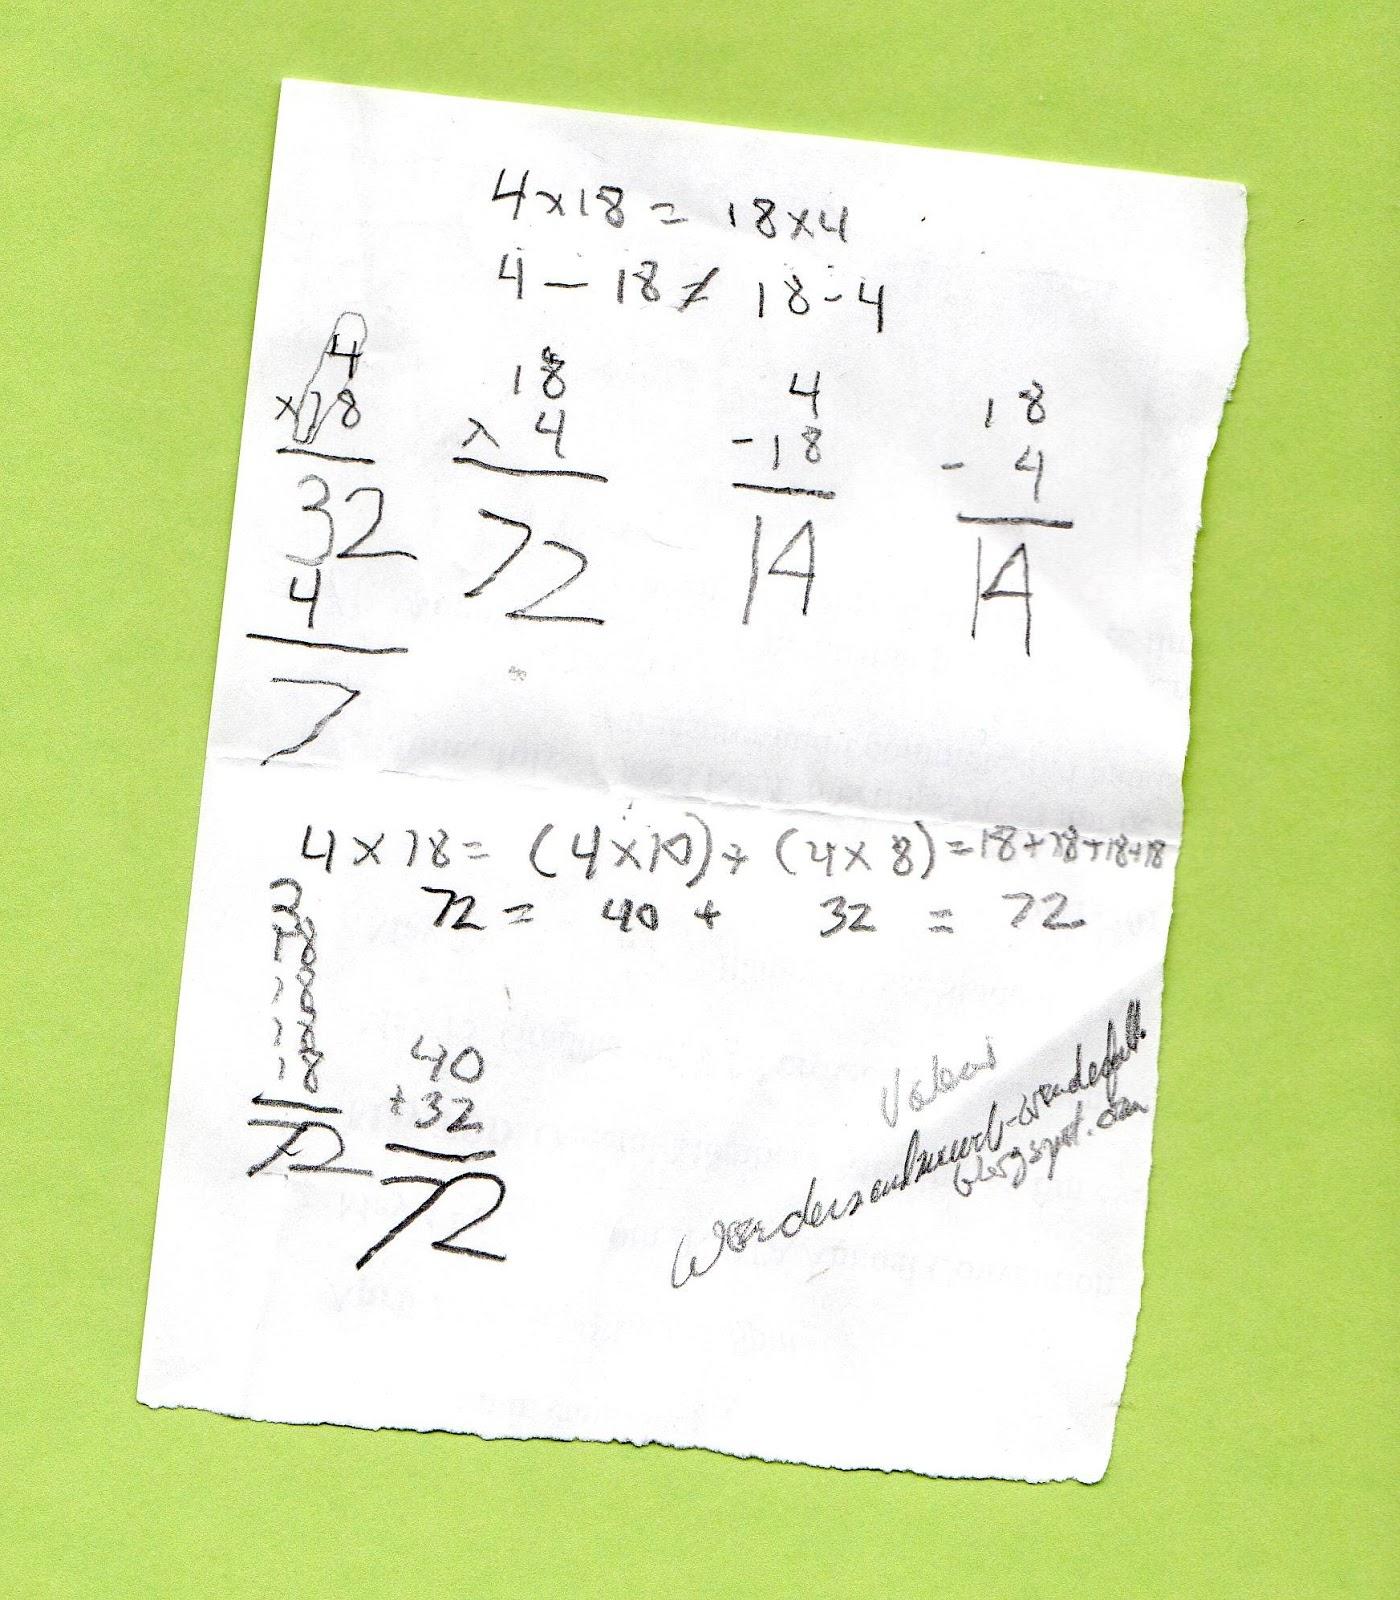 Wonderfull Still Trying To Crack The Math Nut